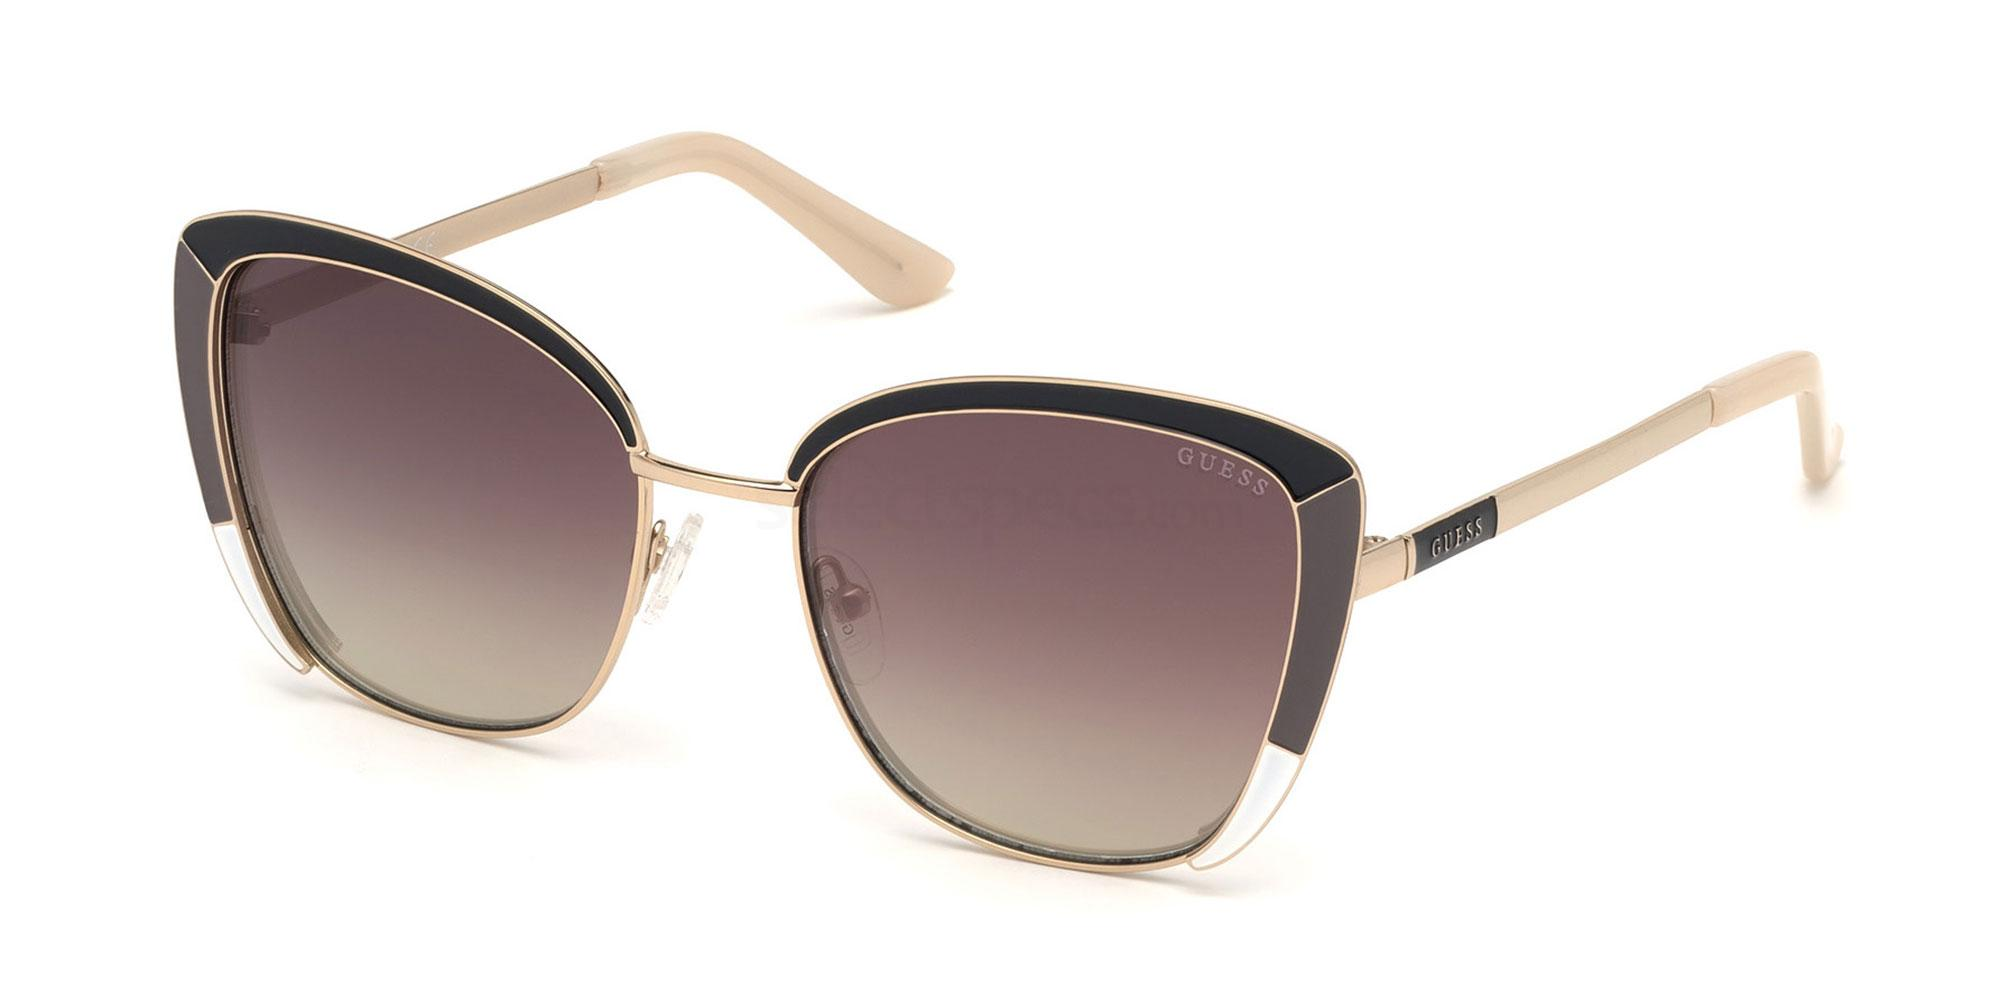 05G GU7585 Sunglasses, Guess